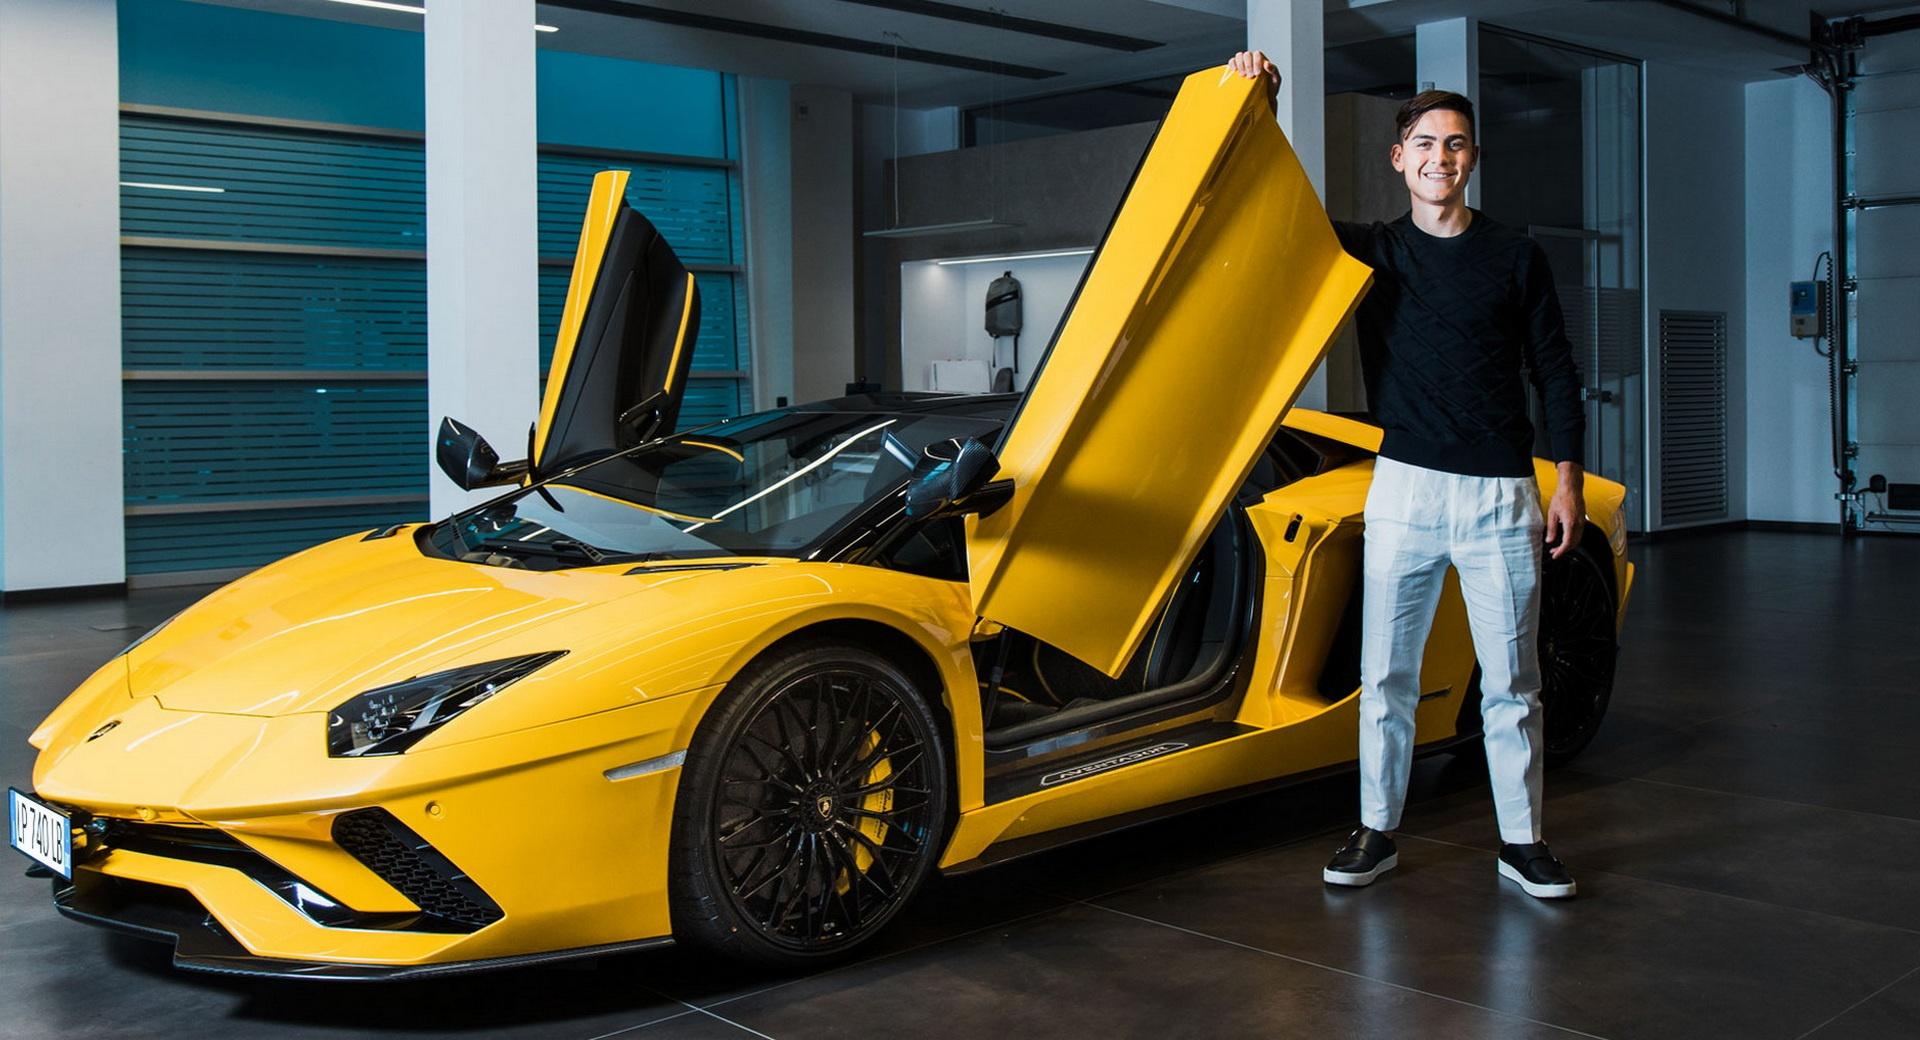 Chi tiết siêu xe Lamborghini Aventador S Roadster của Paulo Dybala - Ảnh 2.